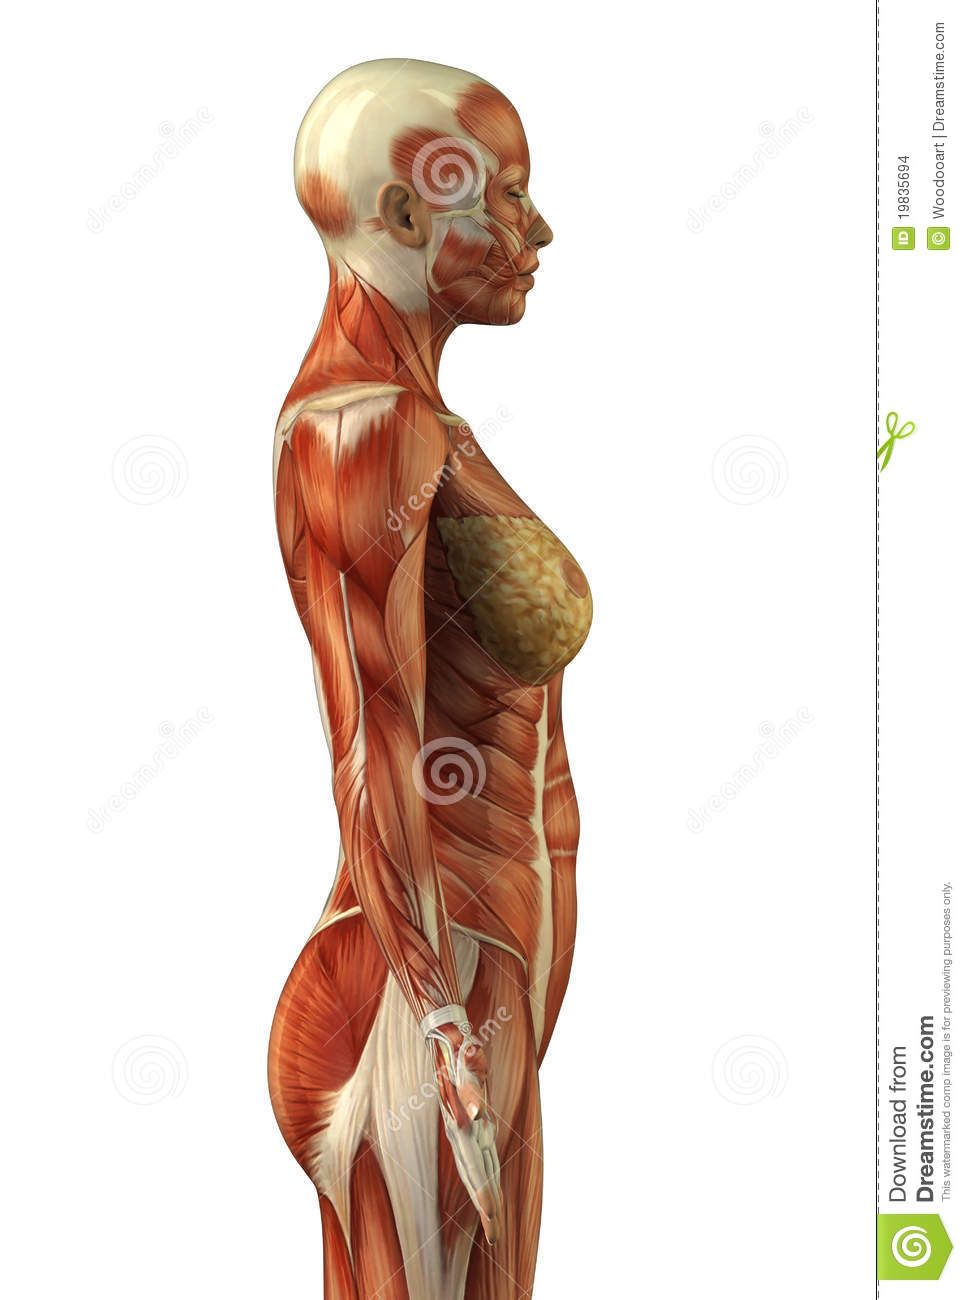 Female Back Muscle Anatomy Torso anatomy female | Human body ...